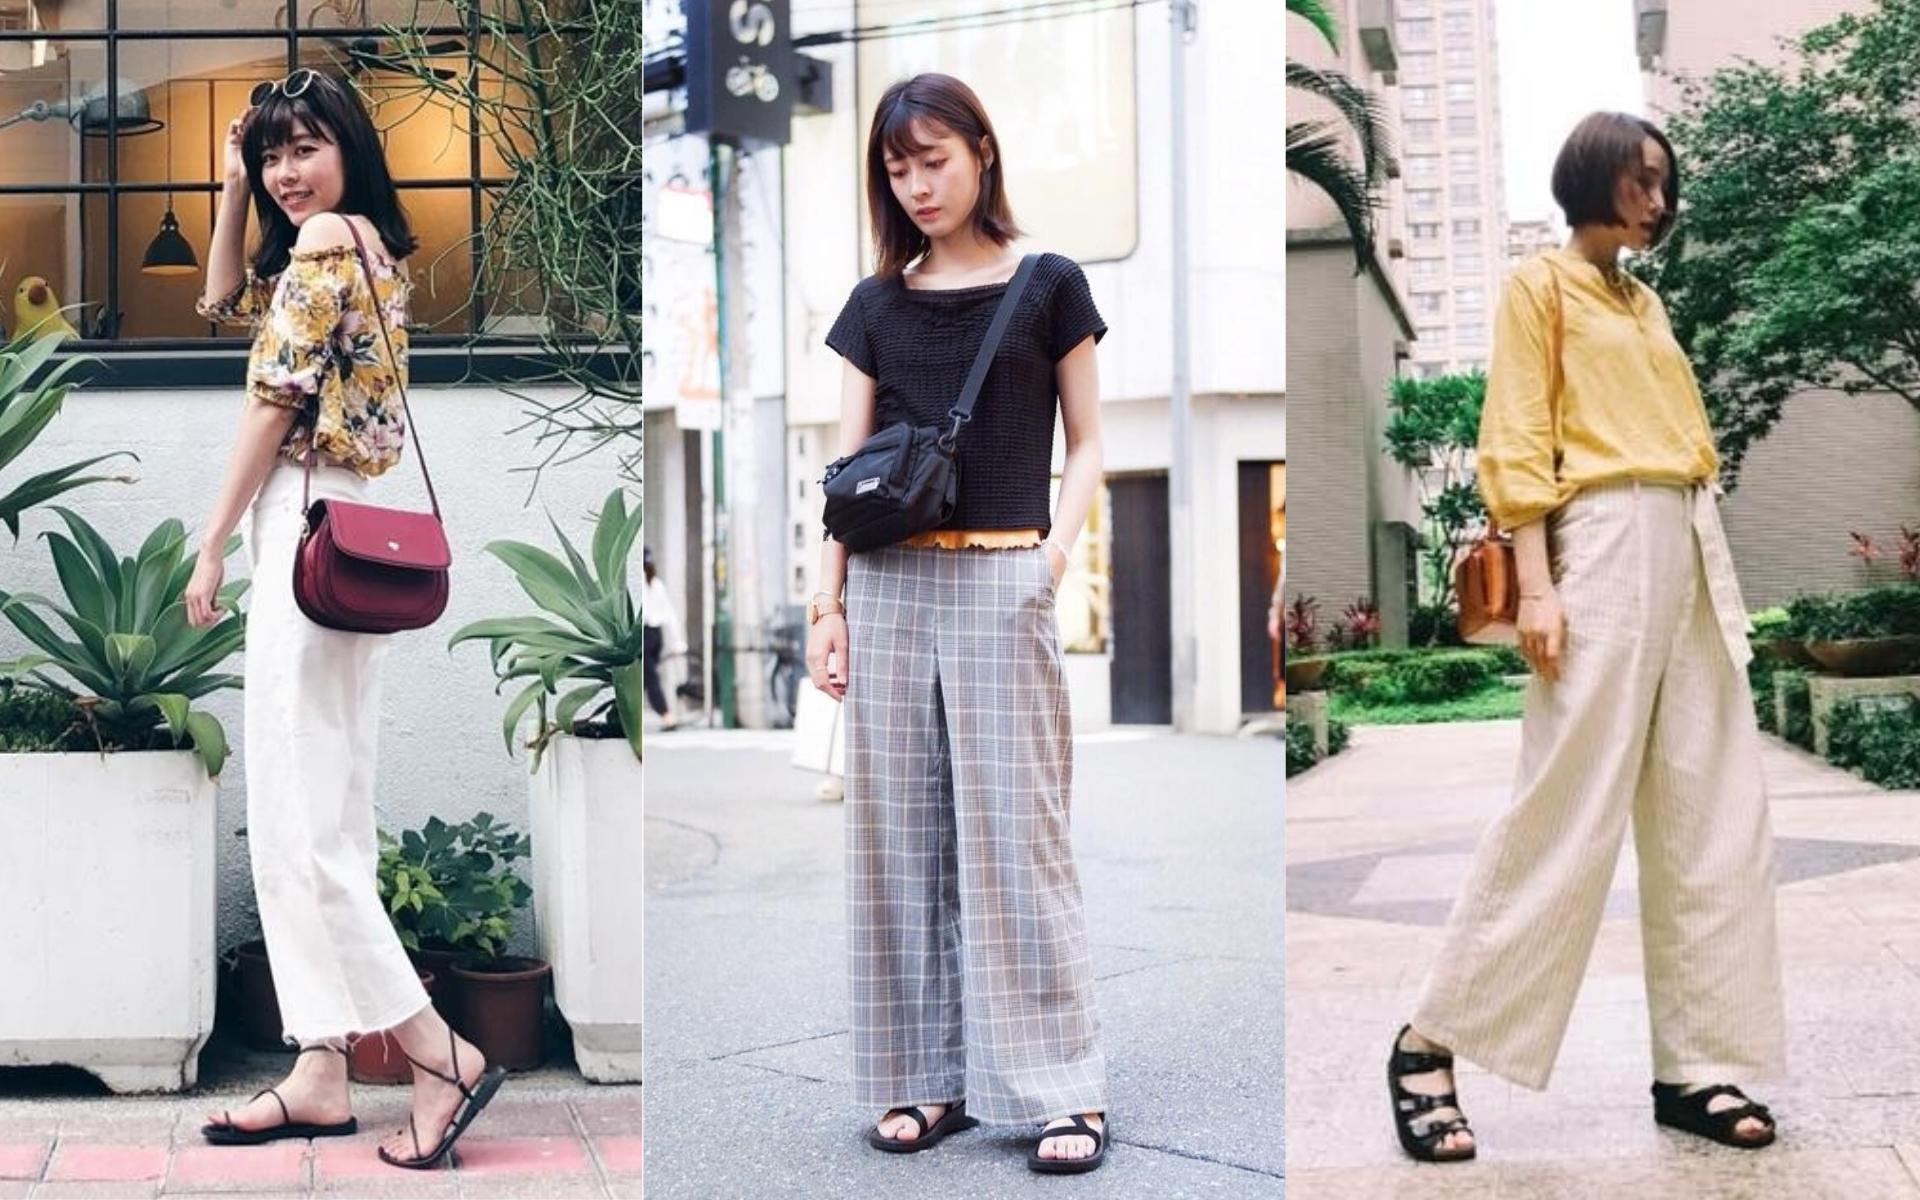 FACY STYLERS|舒適又時髦,四款夏日寬褲穿搭示範